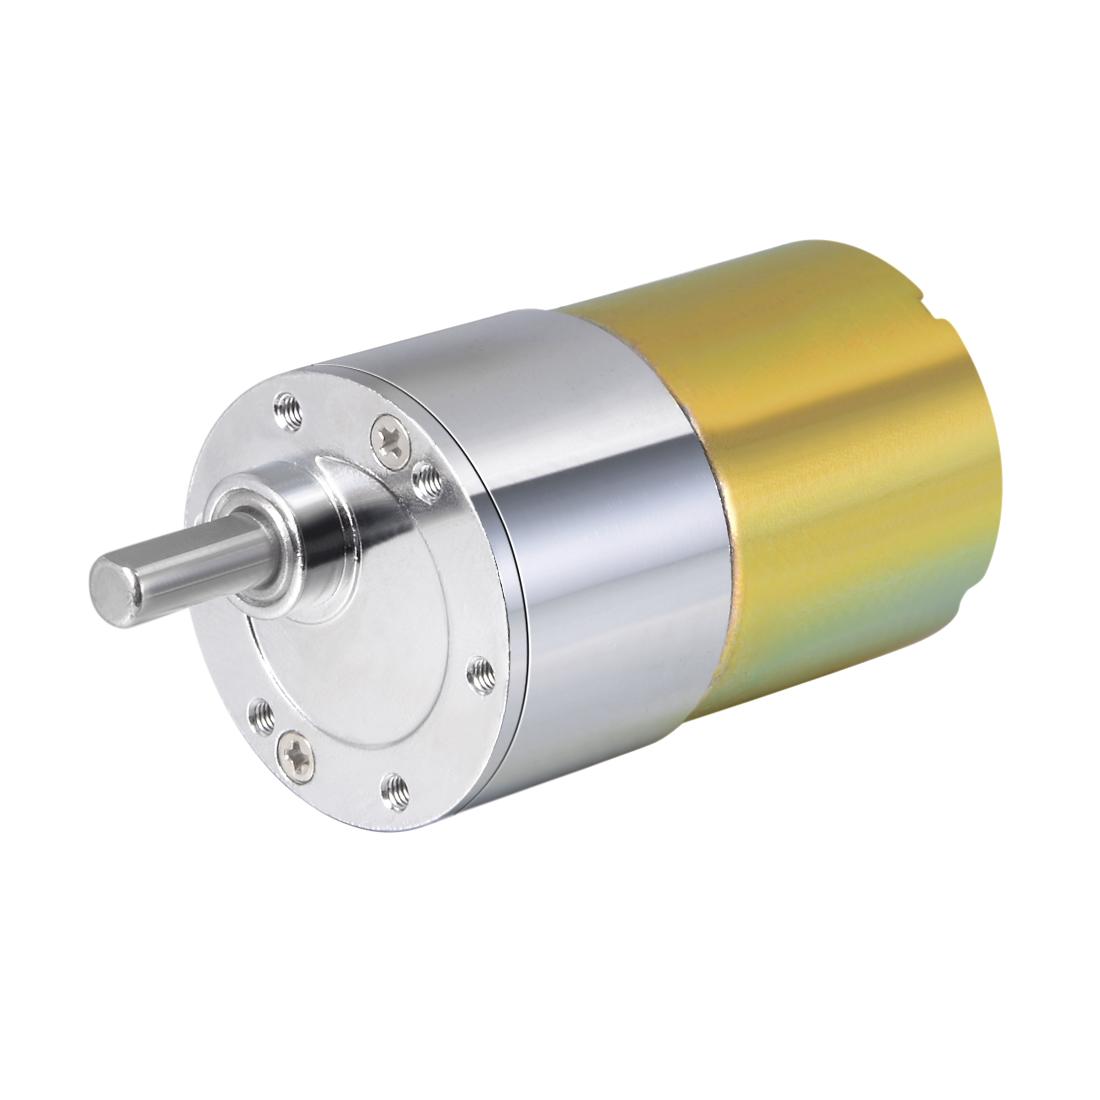 24V DC 400 RPM Gear Motor High Torque Reduction Gearbox Eccentric Output Shaft